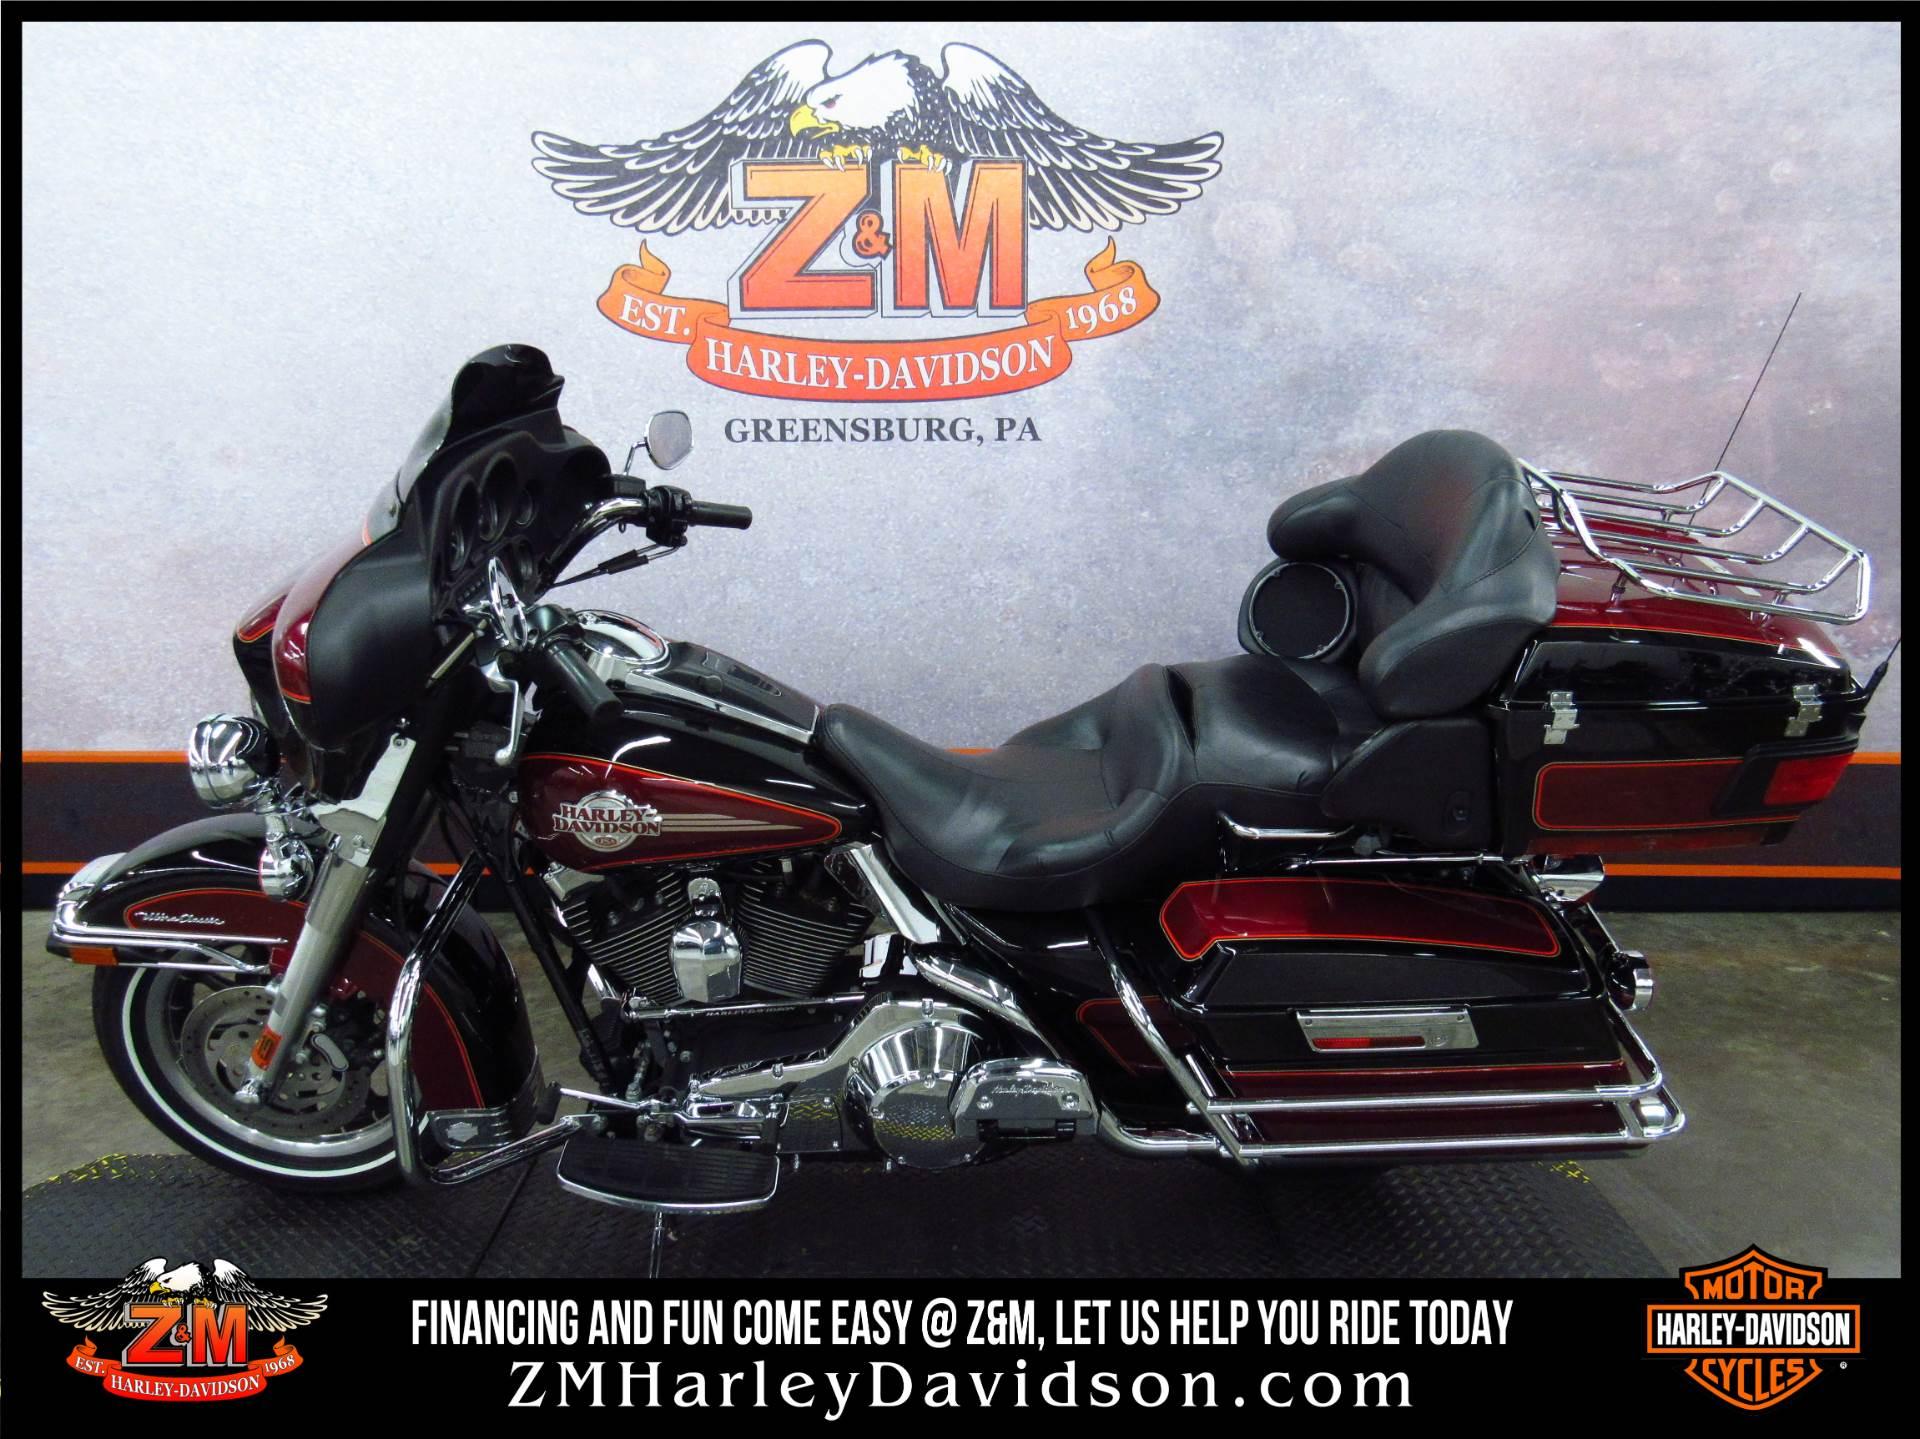 2005 Harley-Davidson FLHTCUI Ultra Classic Electra Glide 4